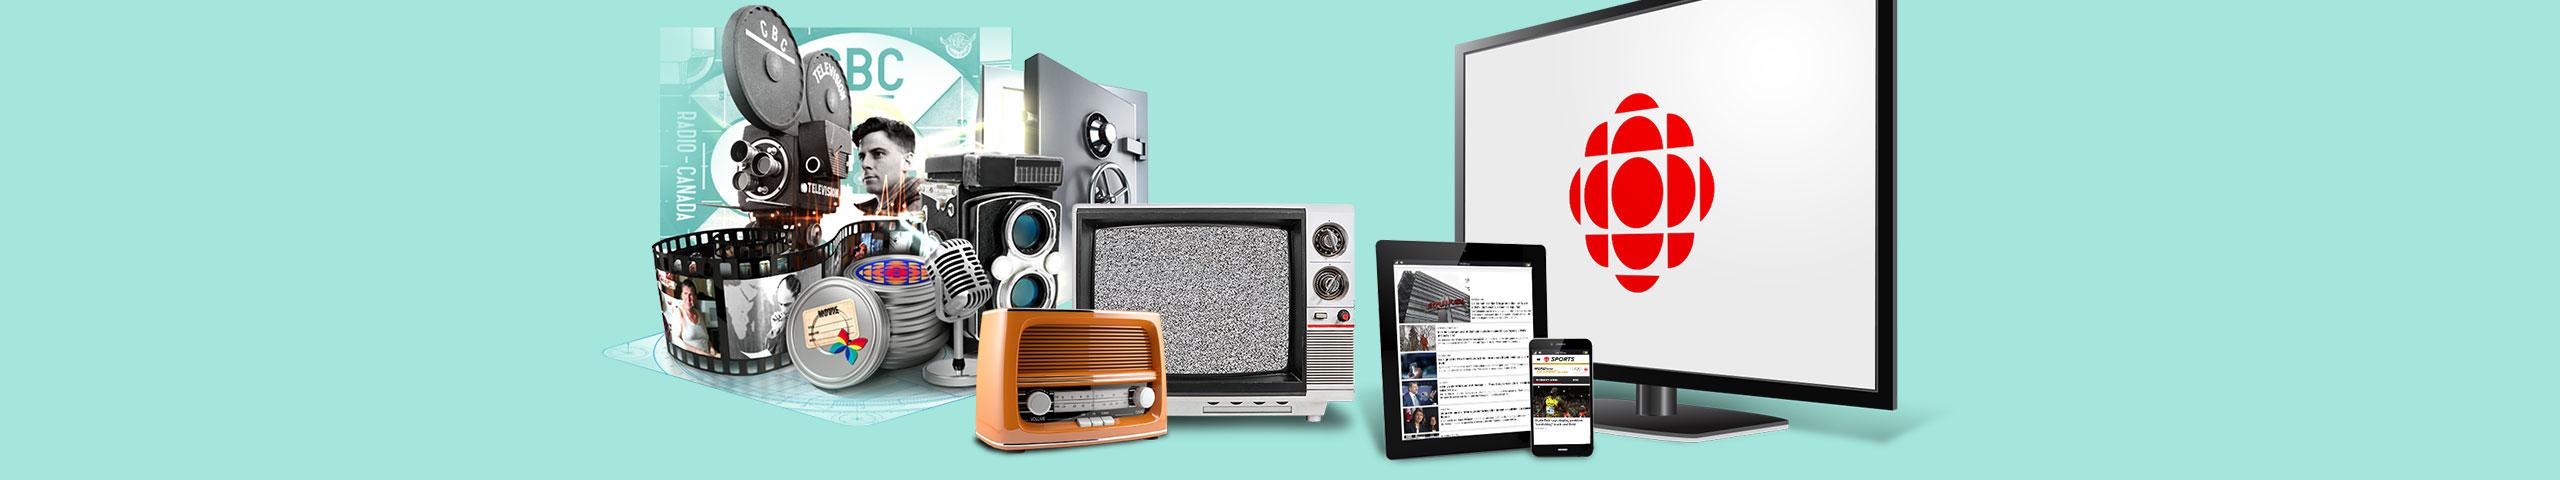 Through the Years - CBC/Radio-Canada